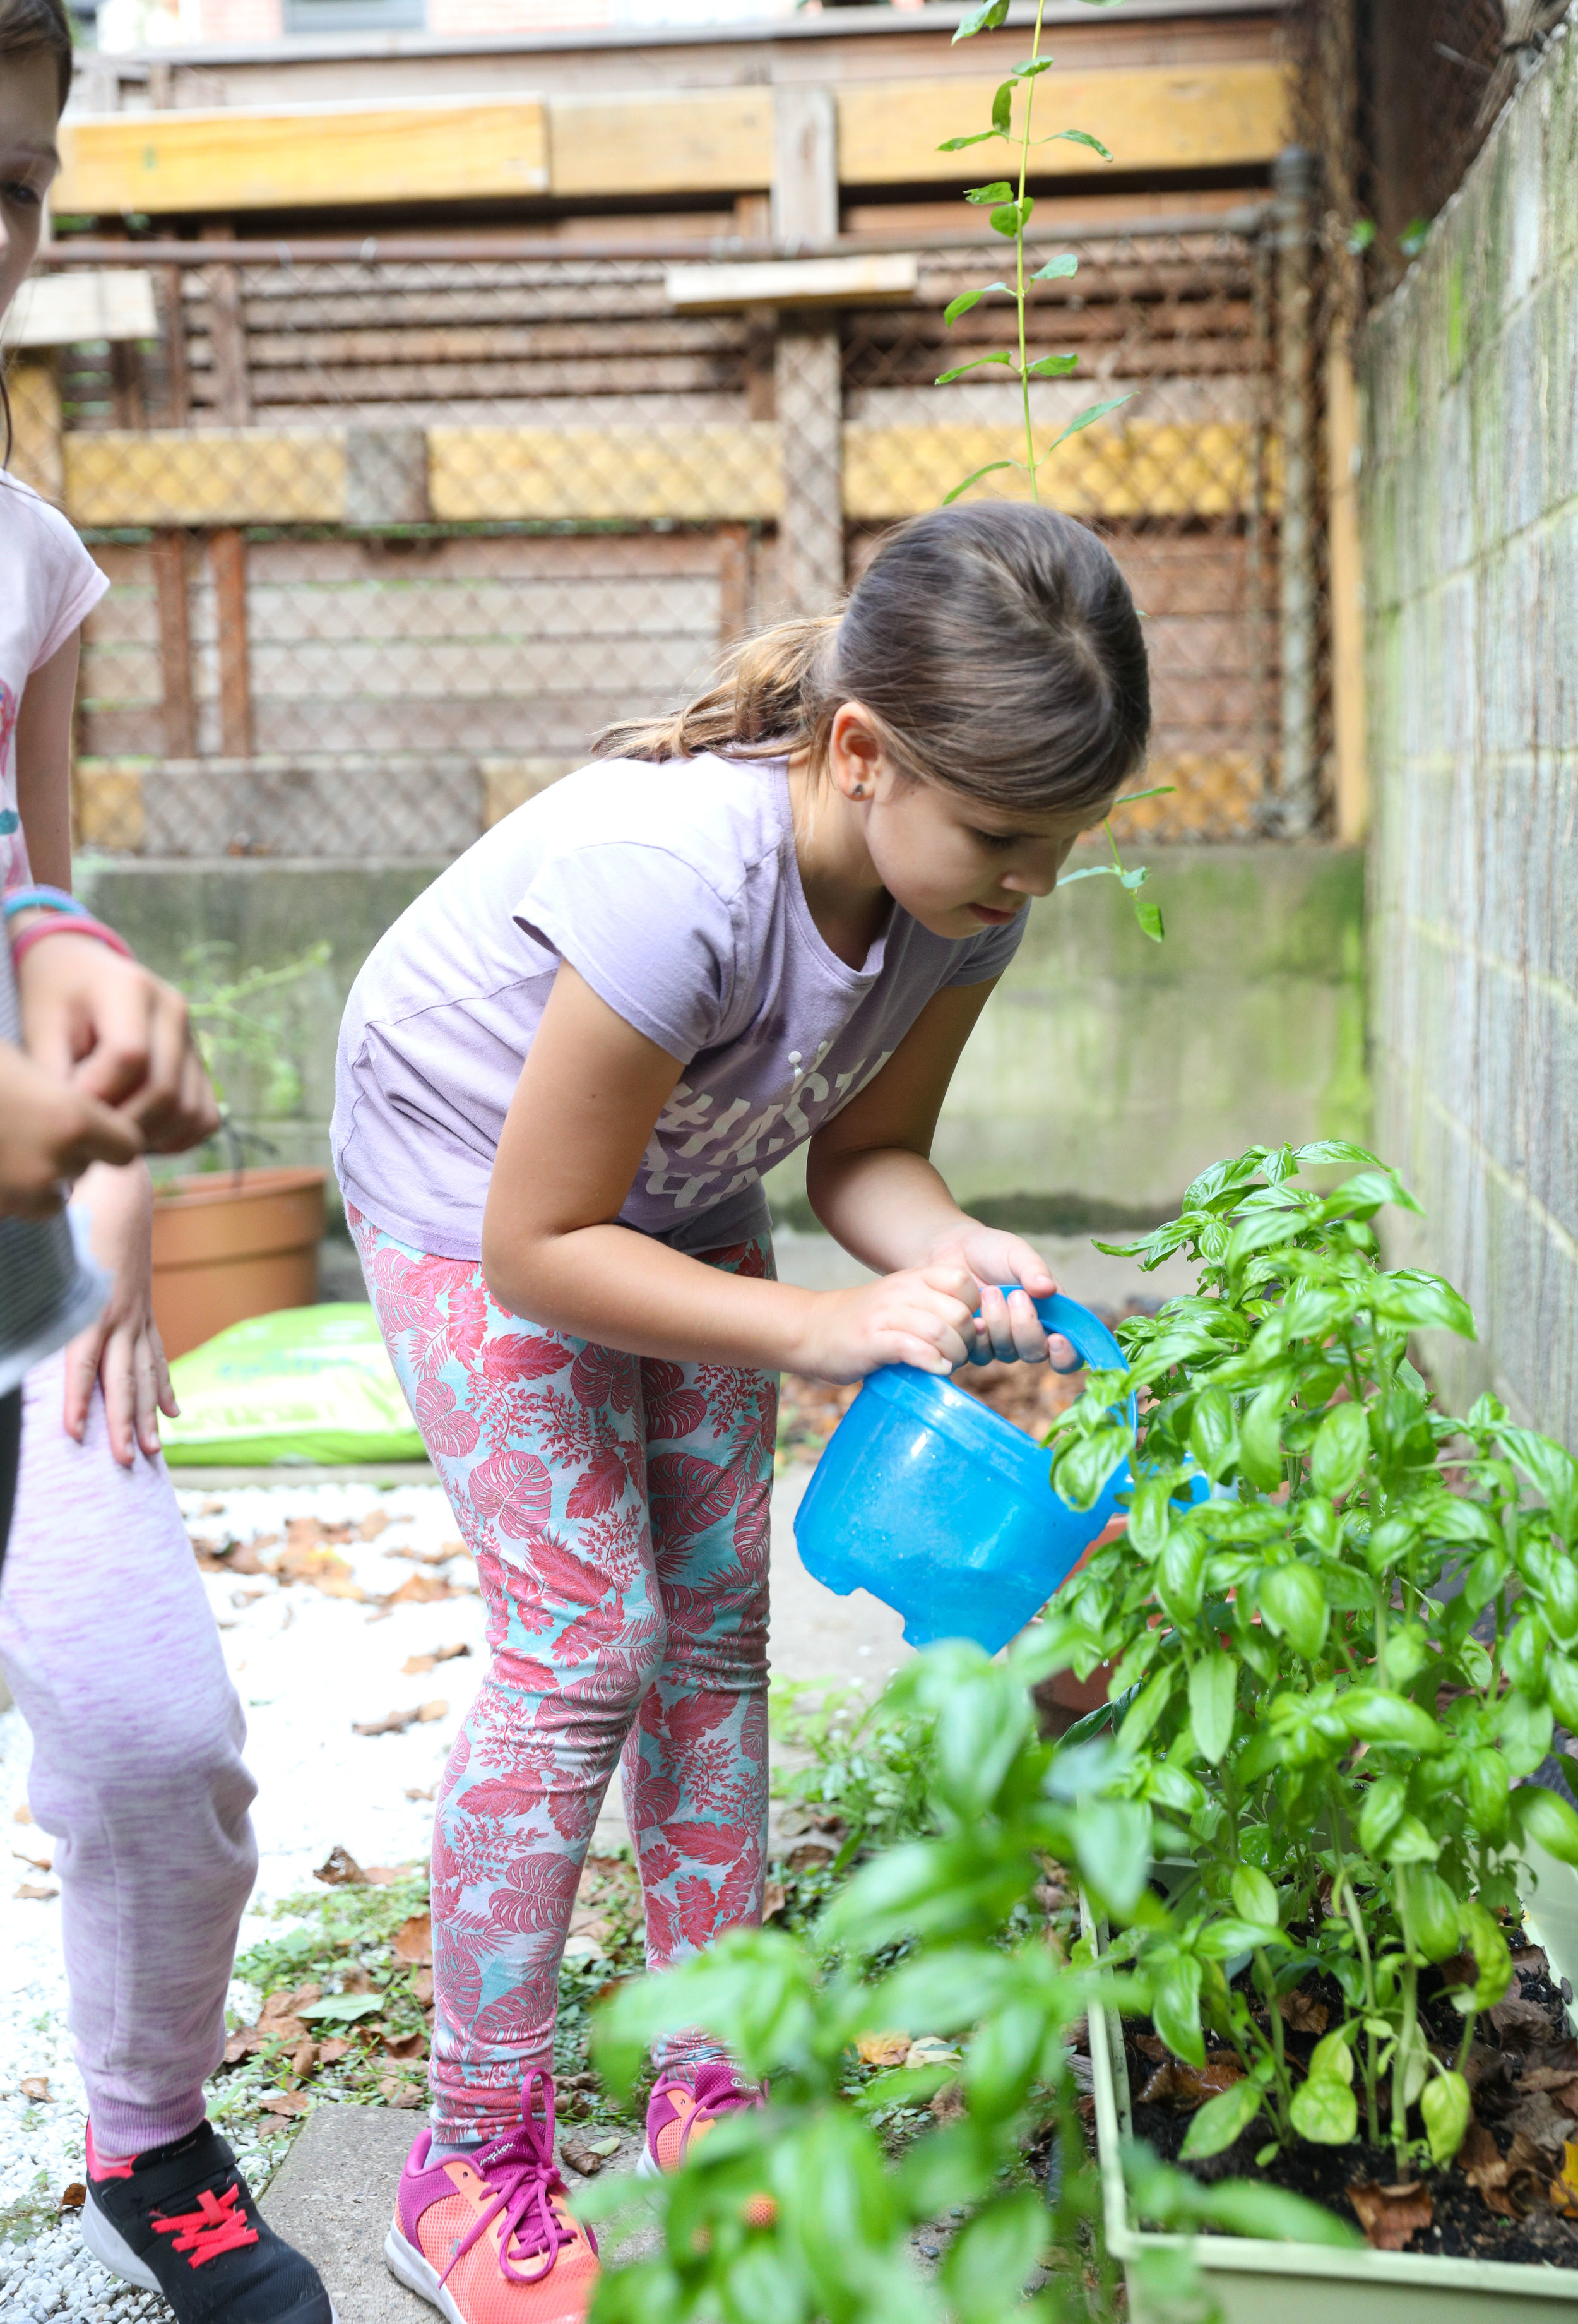 gardening after school l.jpg